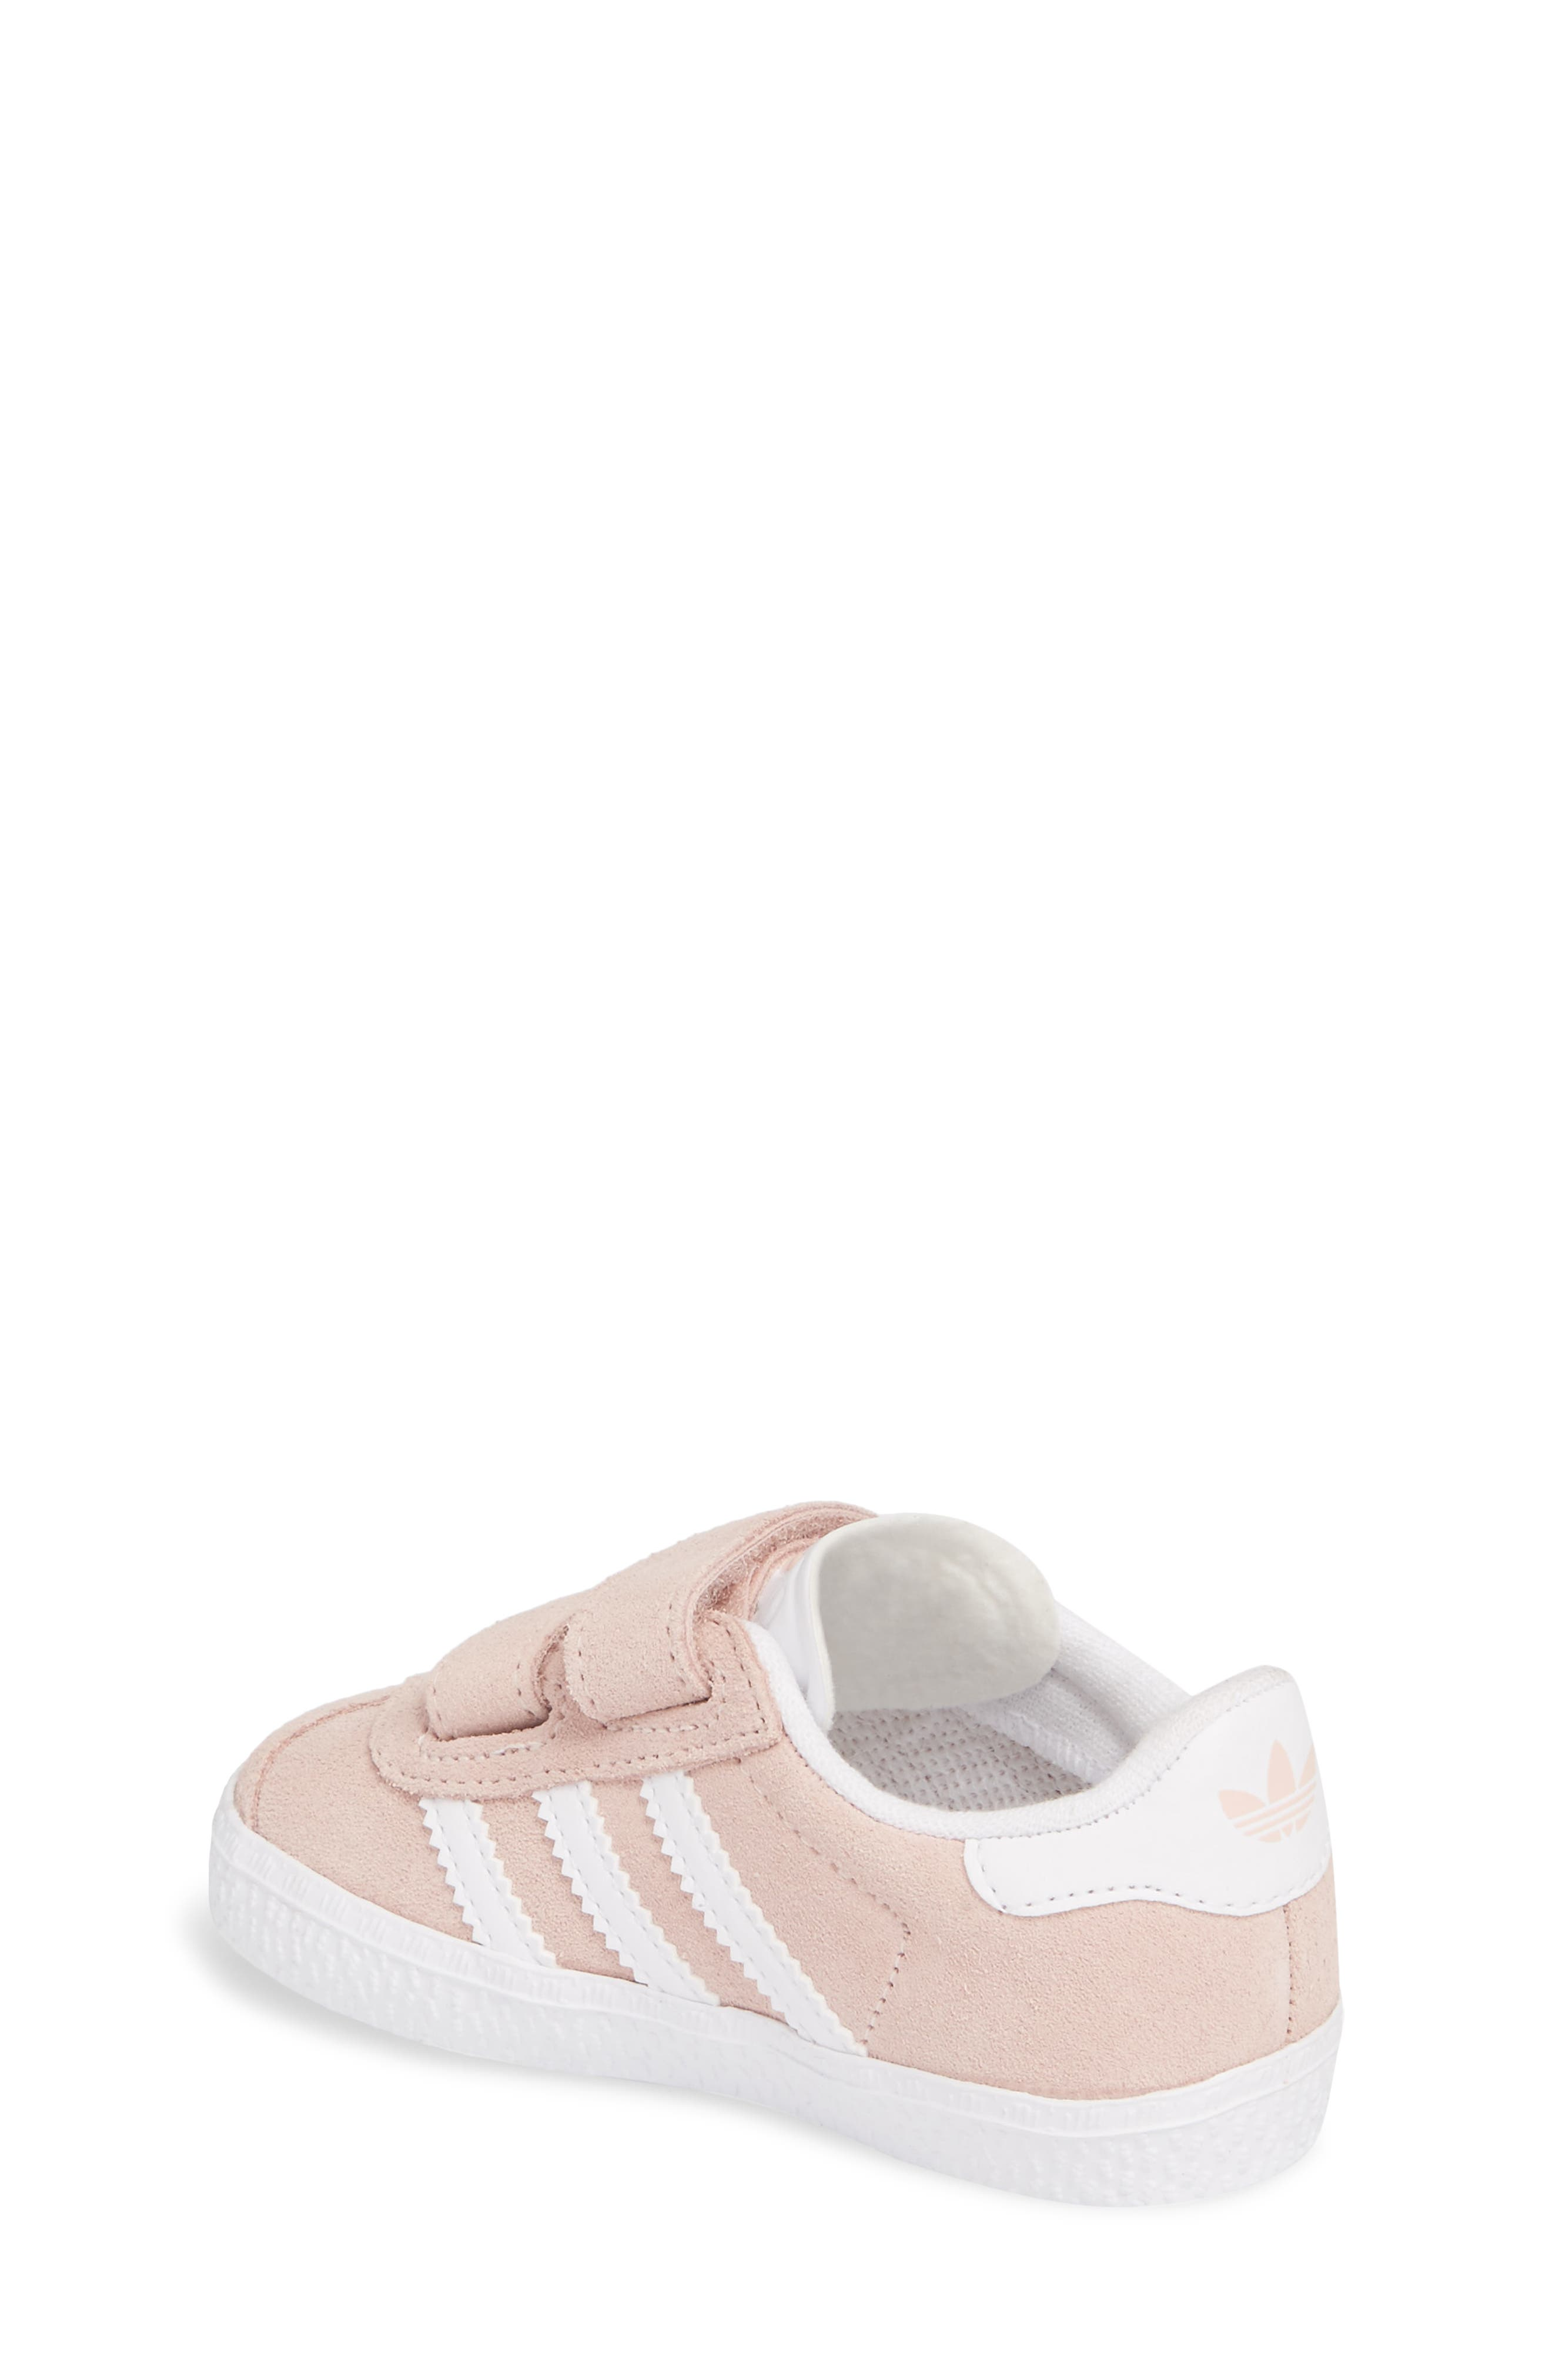 Gazelle Sneaker,                             Alternate thumbnail 2, color,                             Icey Pink / White / White